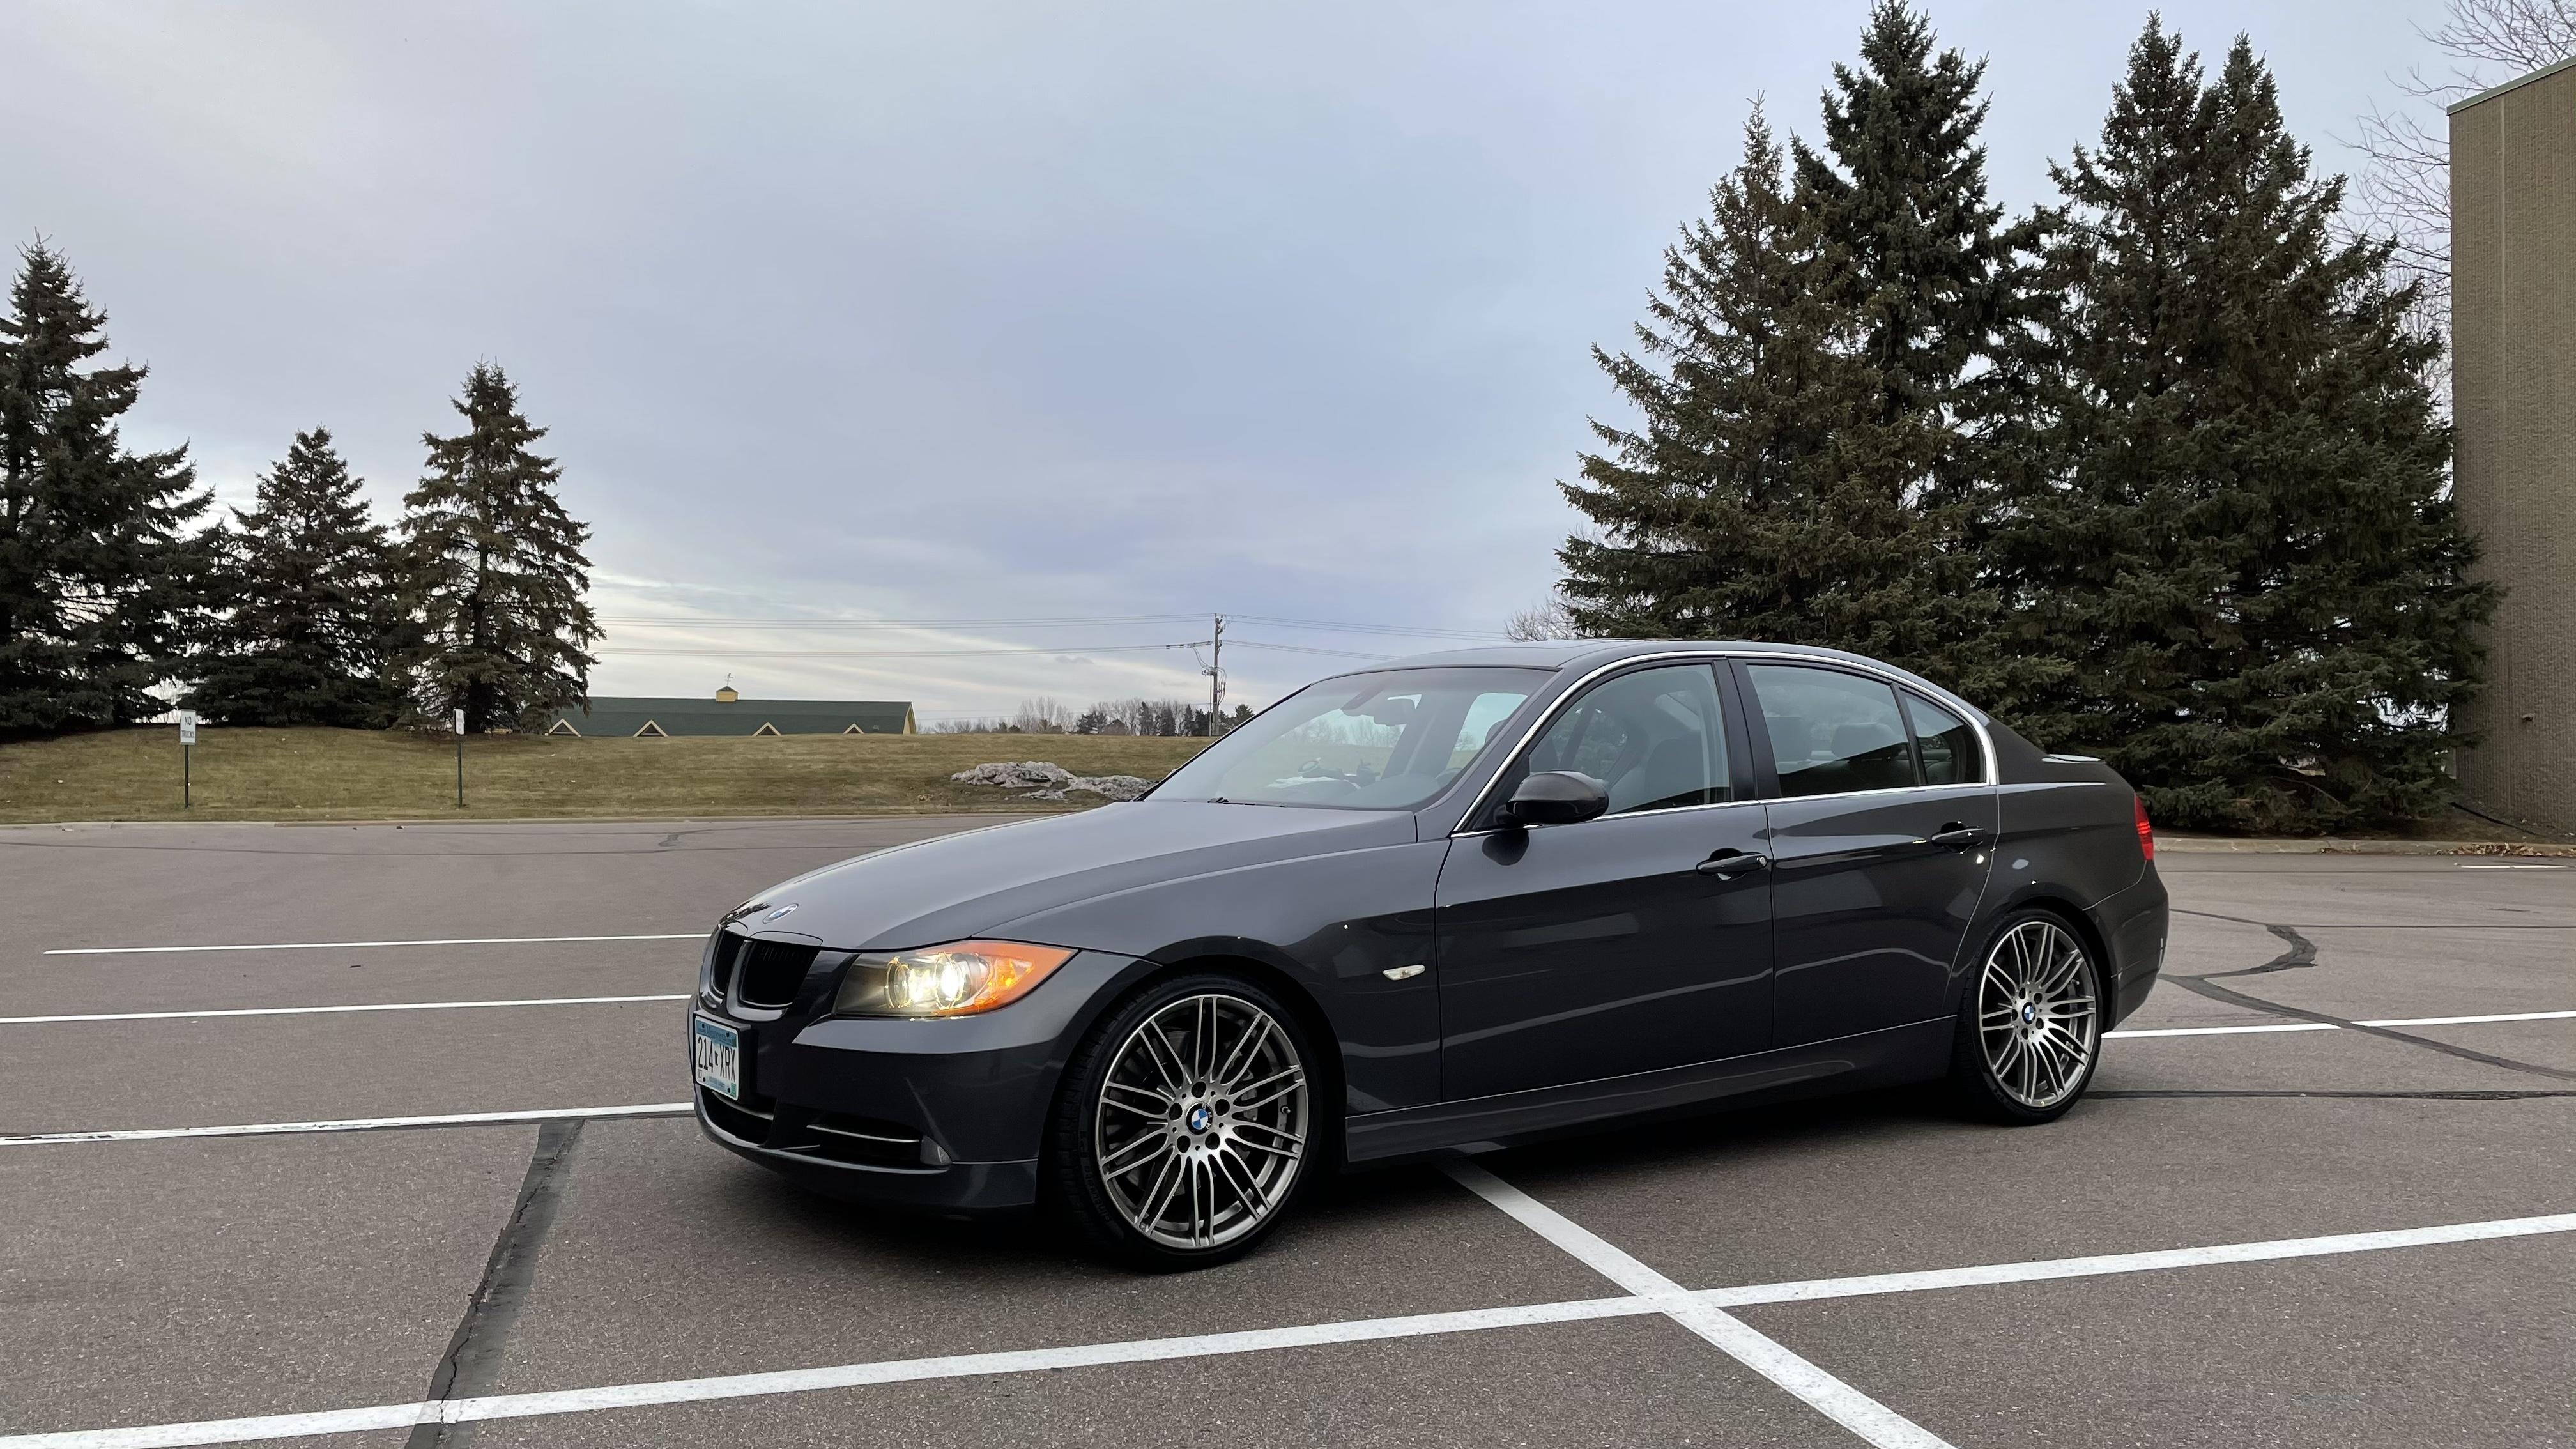 For Sale: 2008 BMW 335i - BMW Performance upgrades - 94k miles